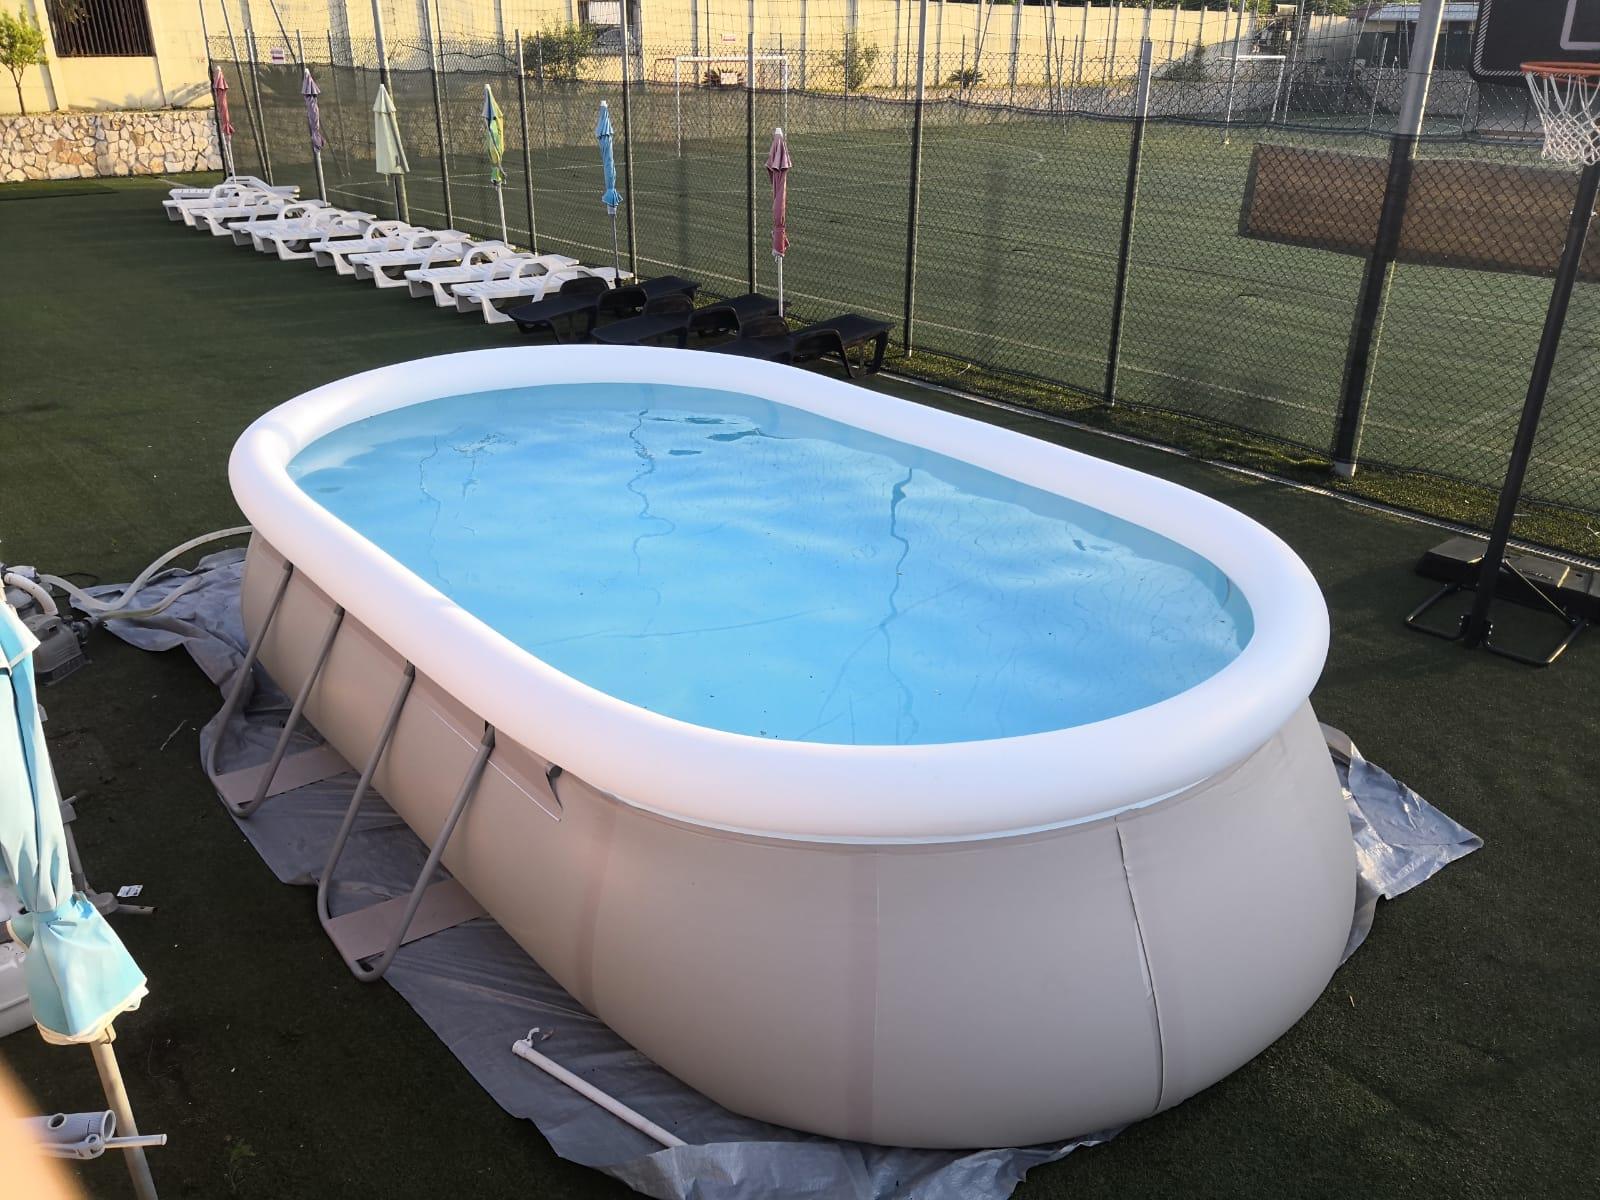 centocellefc piscina 2019 - 13